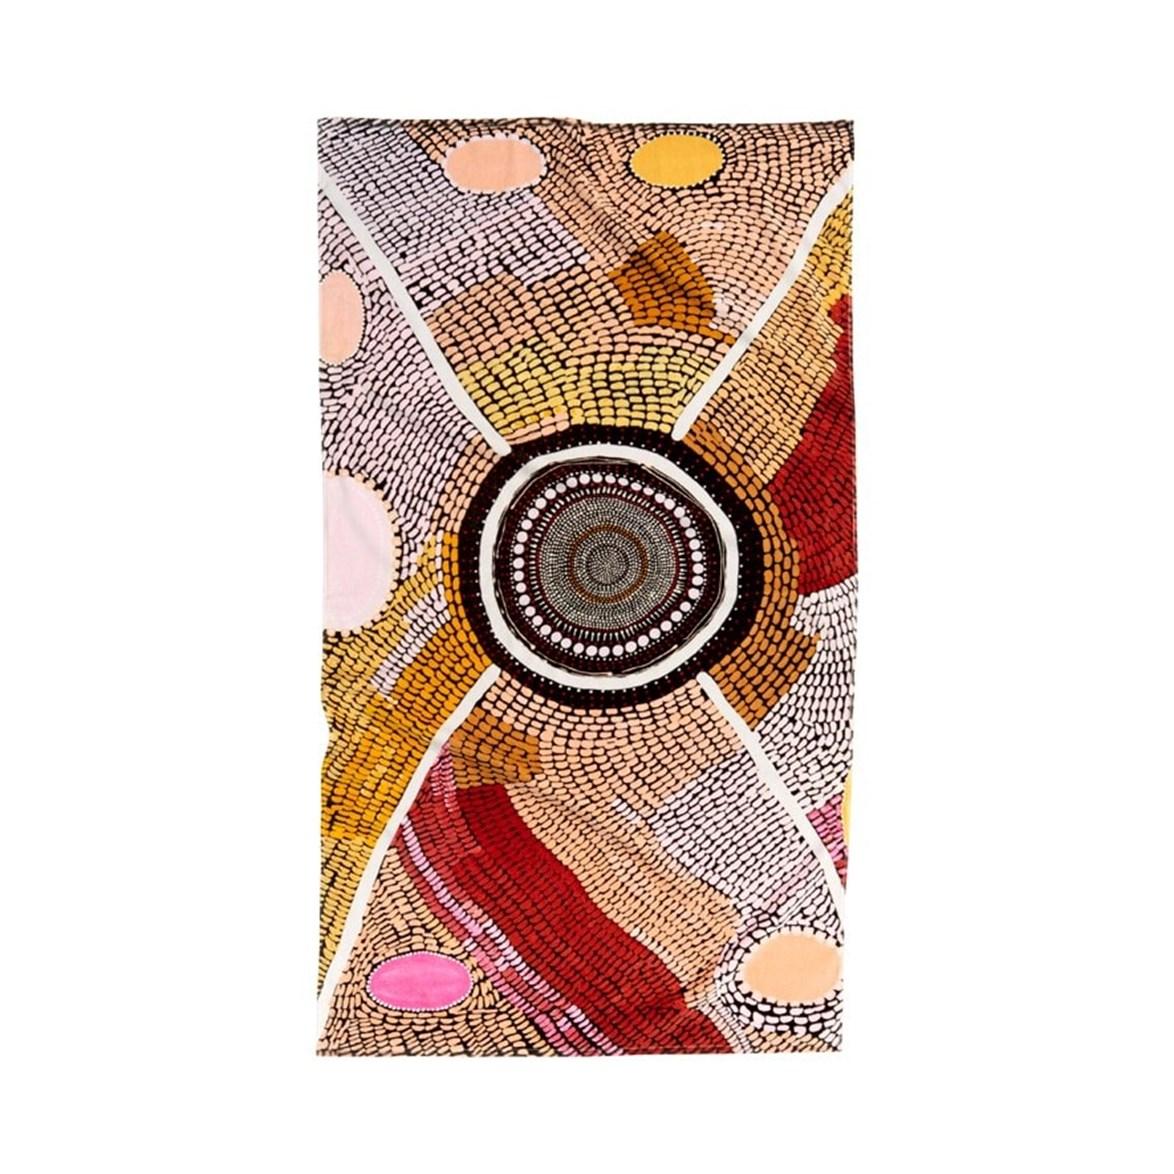 "Adairs x Miimi + Jiinda Jaanymili Printed Velour beach towel, $79.99, [Adairs](https://www.adairs.com.au/bathroom/beach-towels/adairs/miimi--jiinda-jaanymili-printed-velour-beach-towel|target=""_blank""|rel=""nofollow"")"